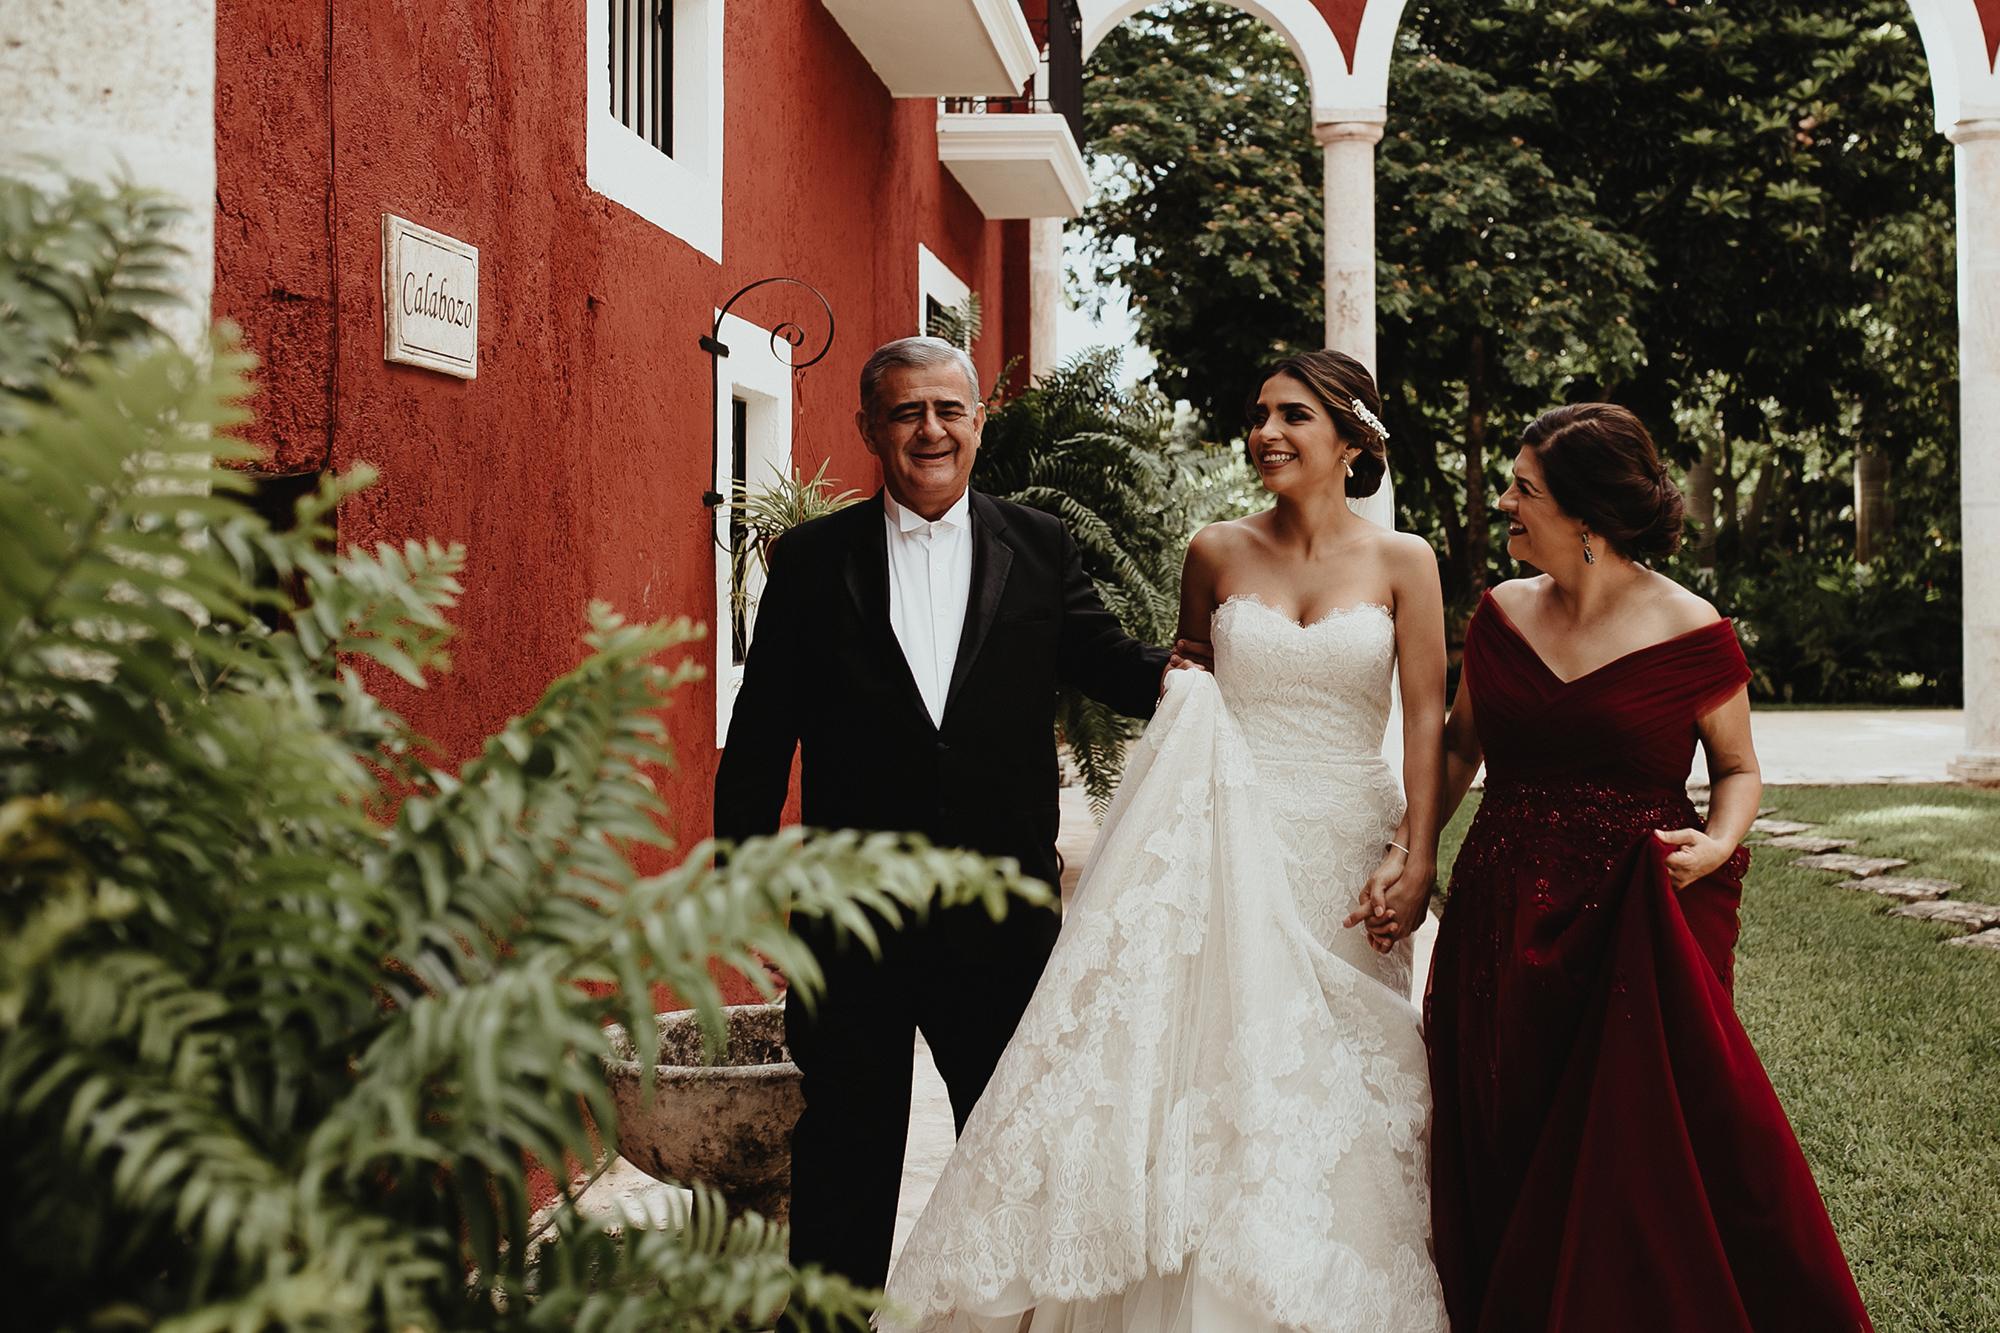 0127F&Yslide_WeddingDstination_MeridaYucatan_HaciendasMerida_BodasMexico_BodasYucatan_Boda_Destino.jpg